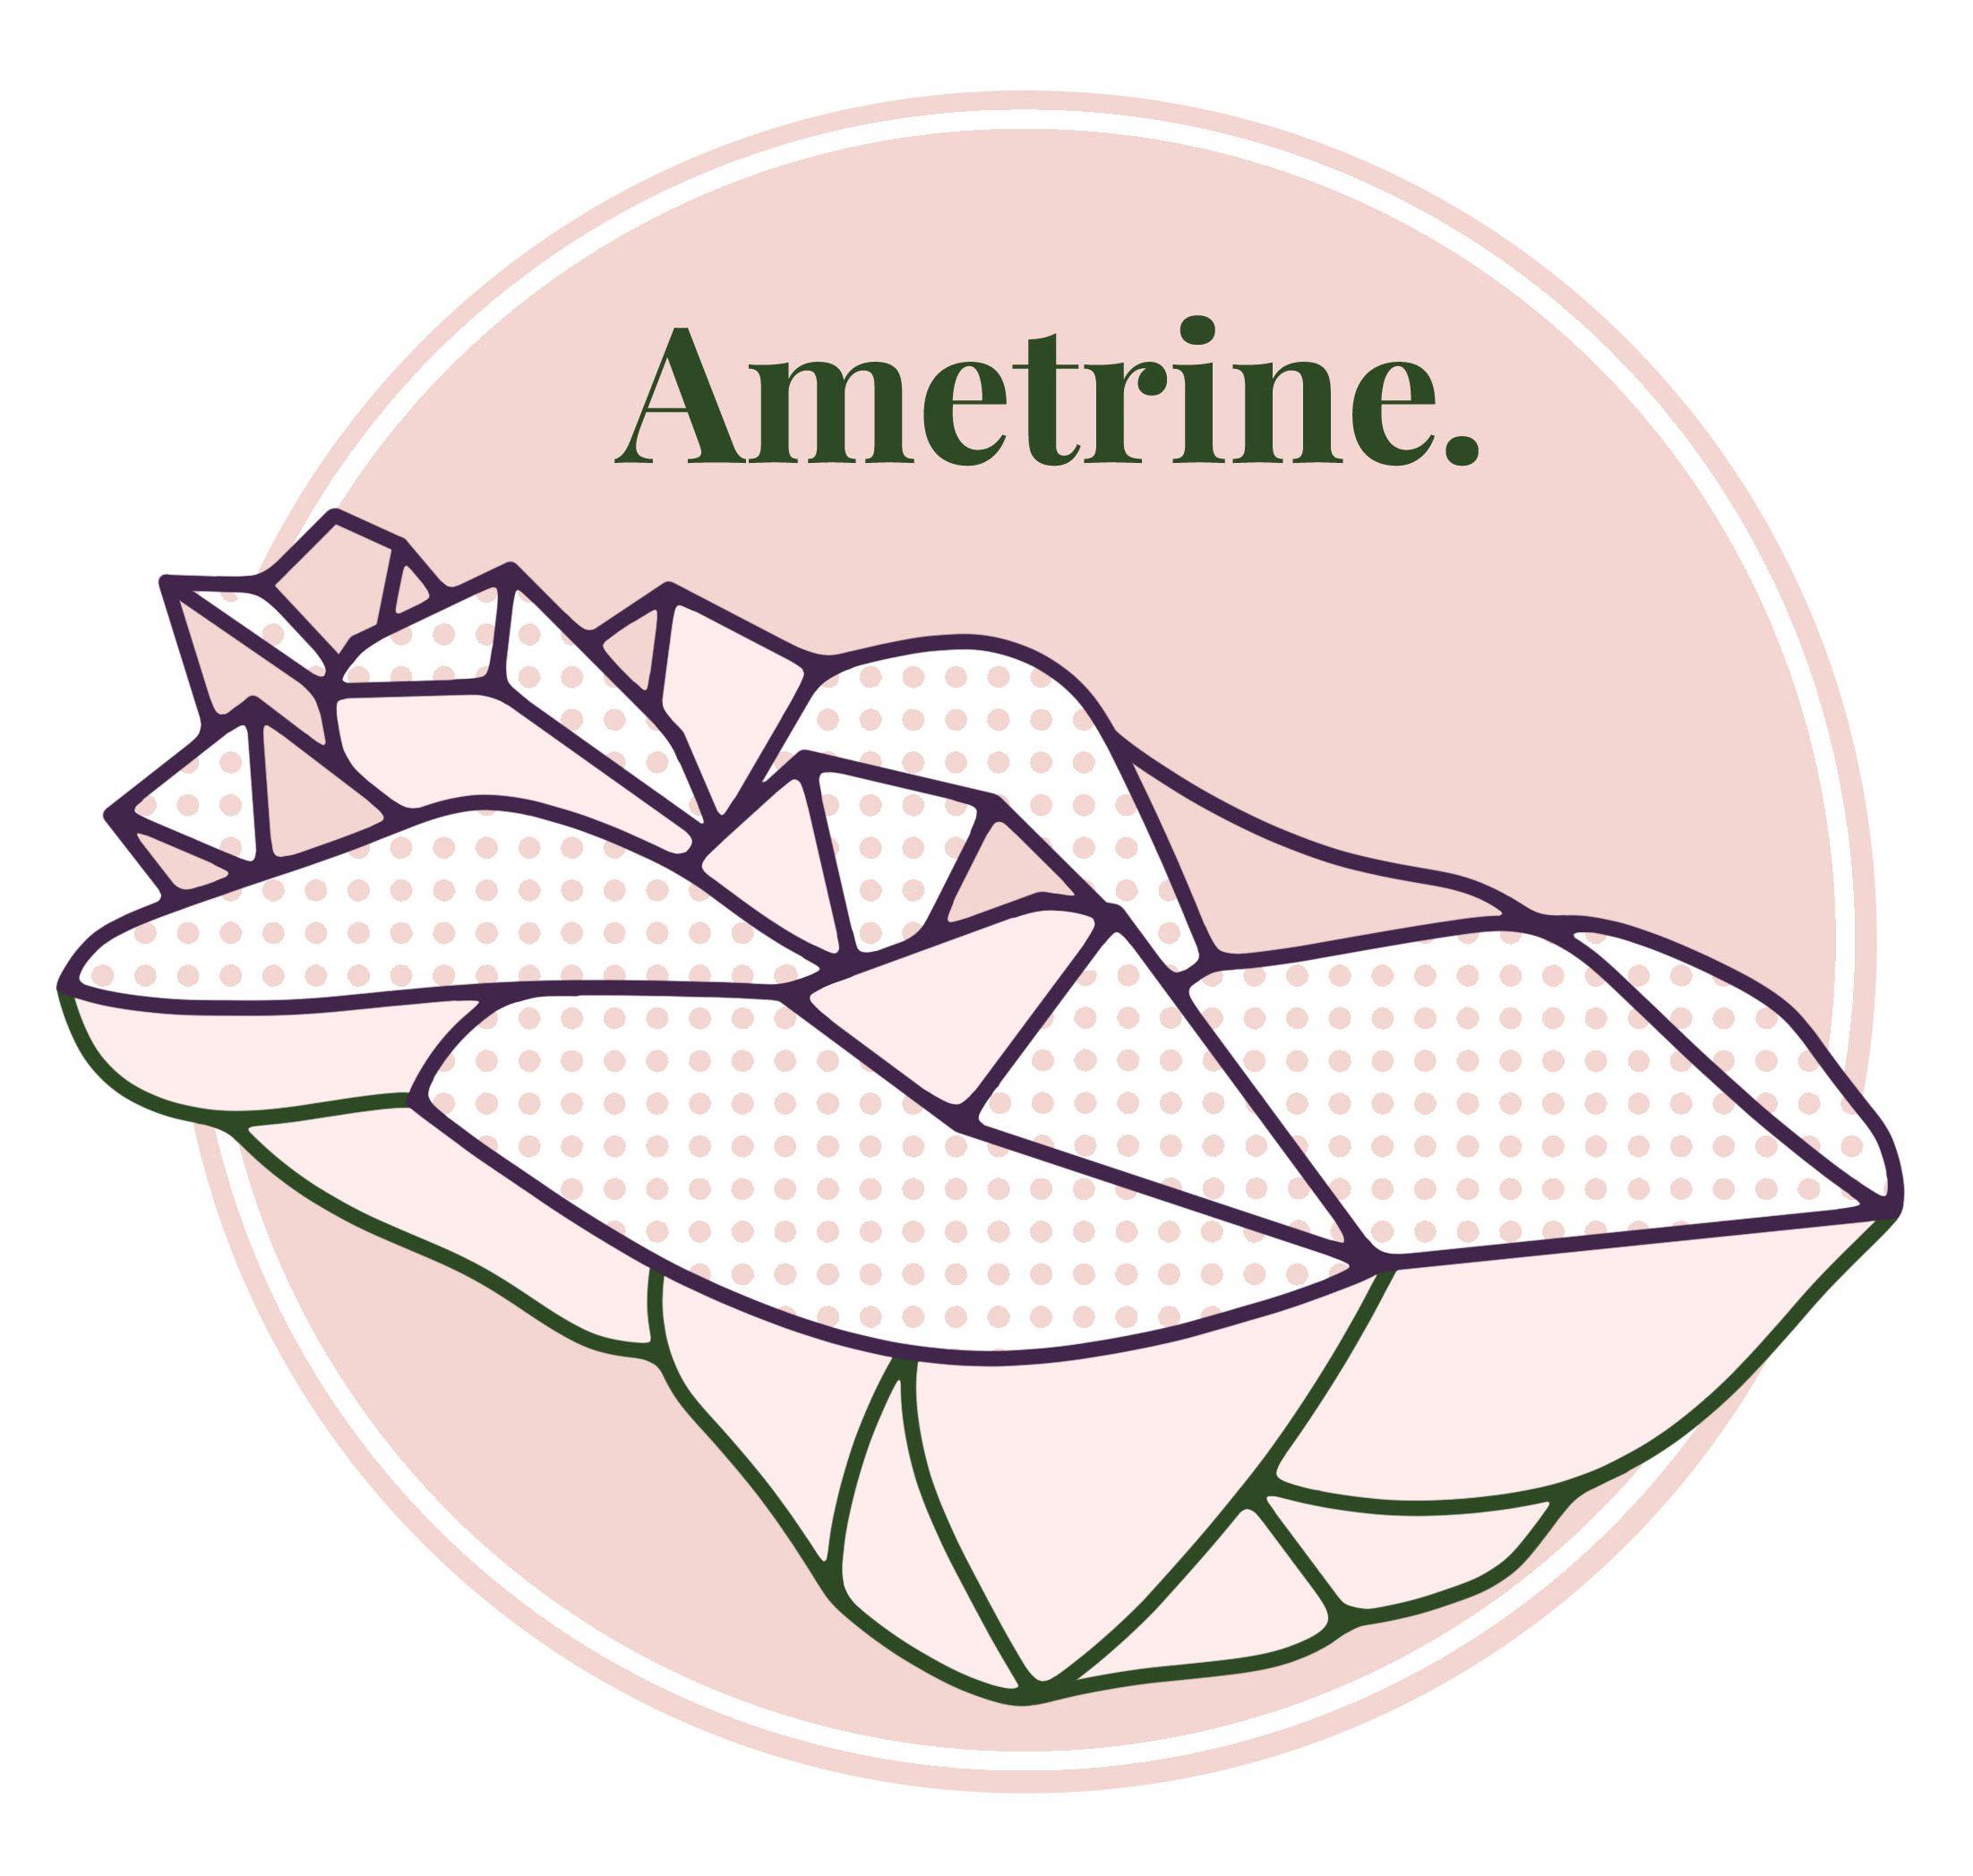 Ametrine Aesthetics